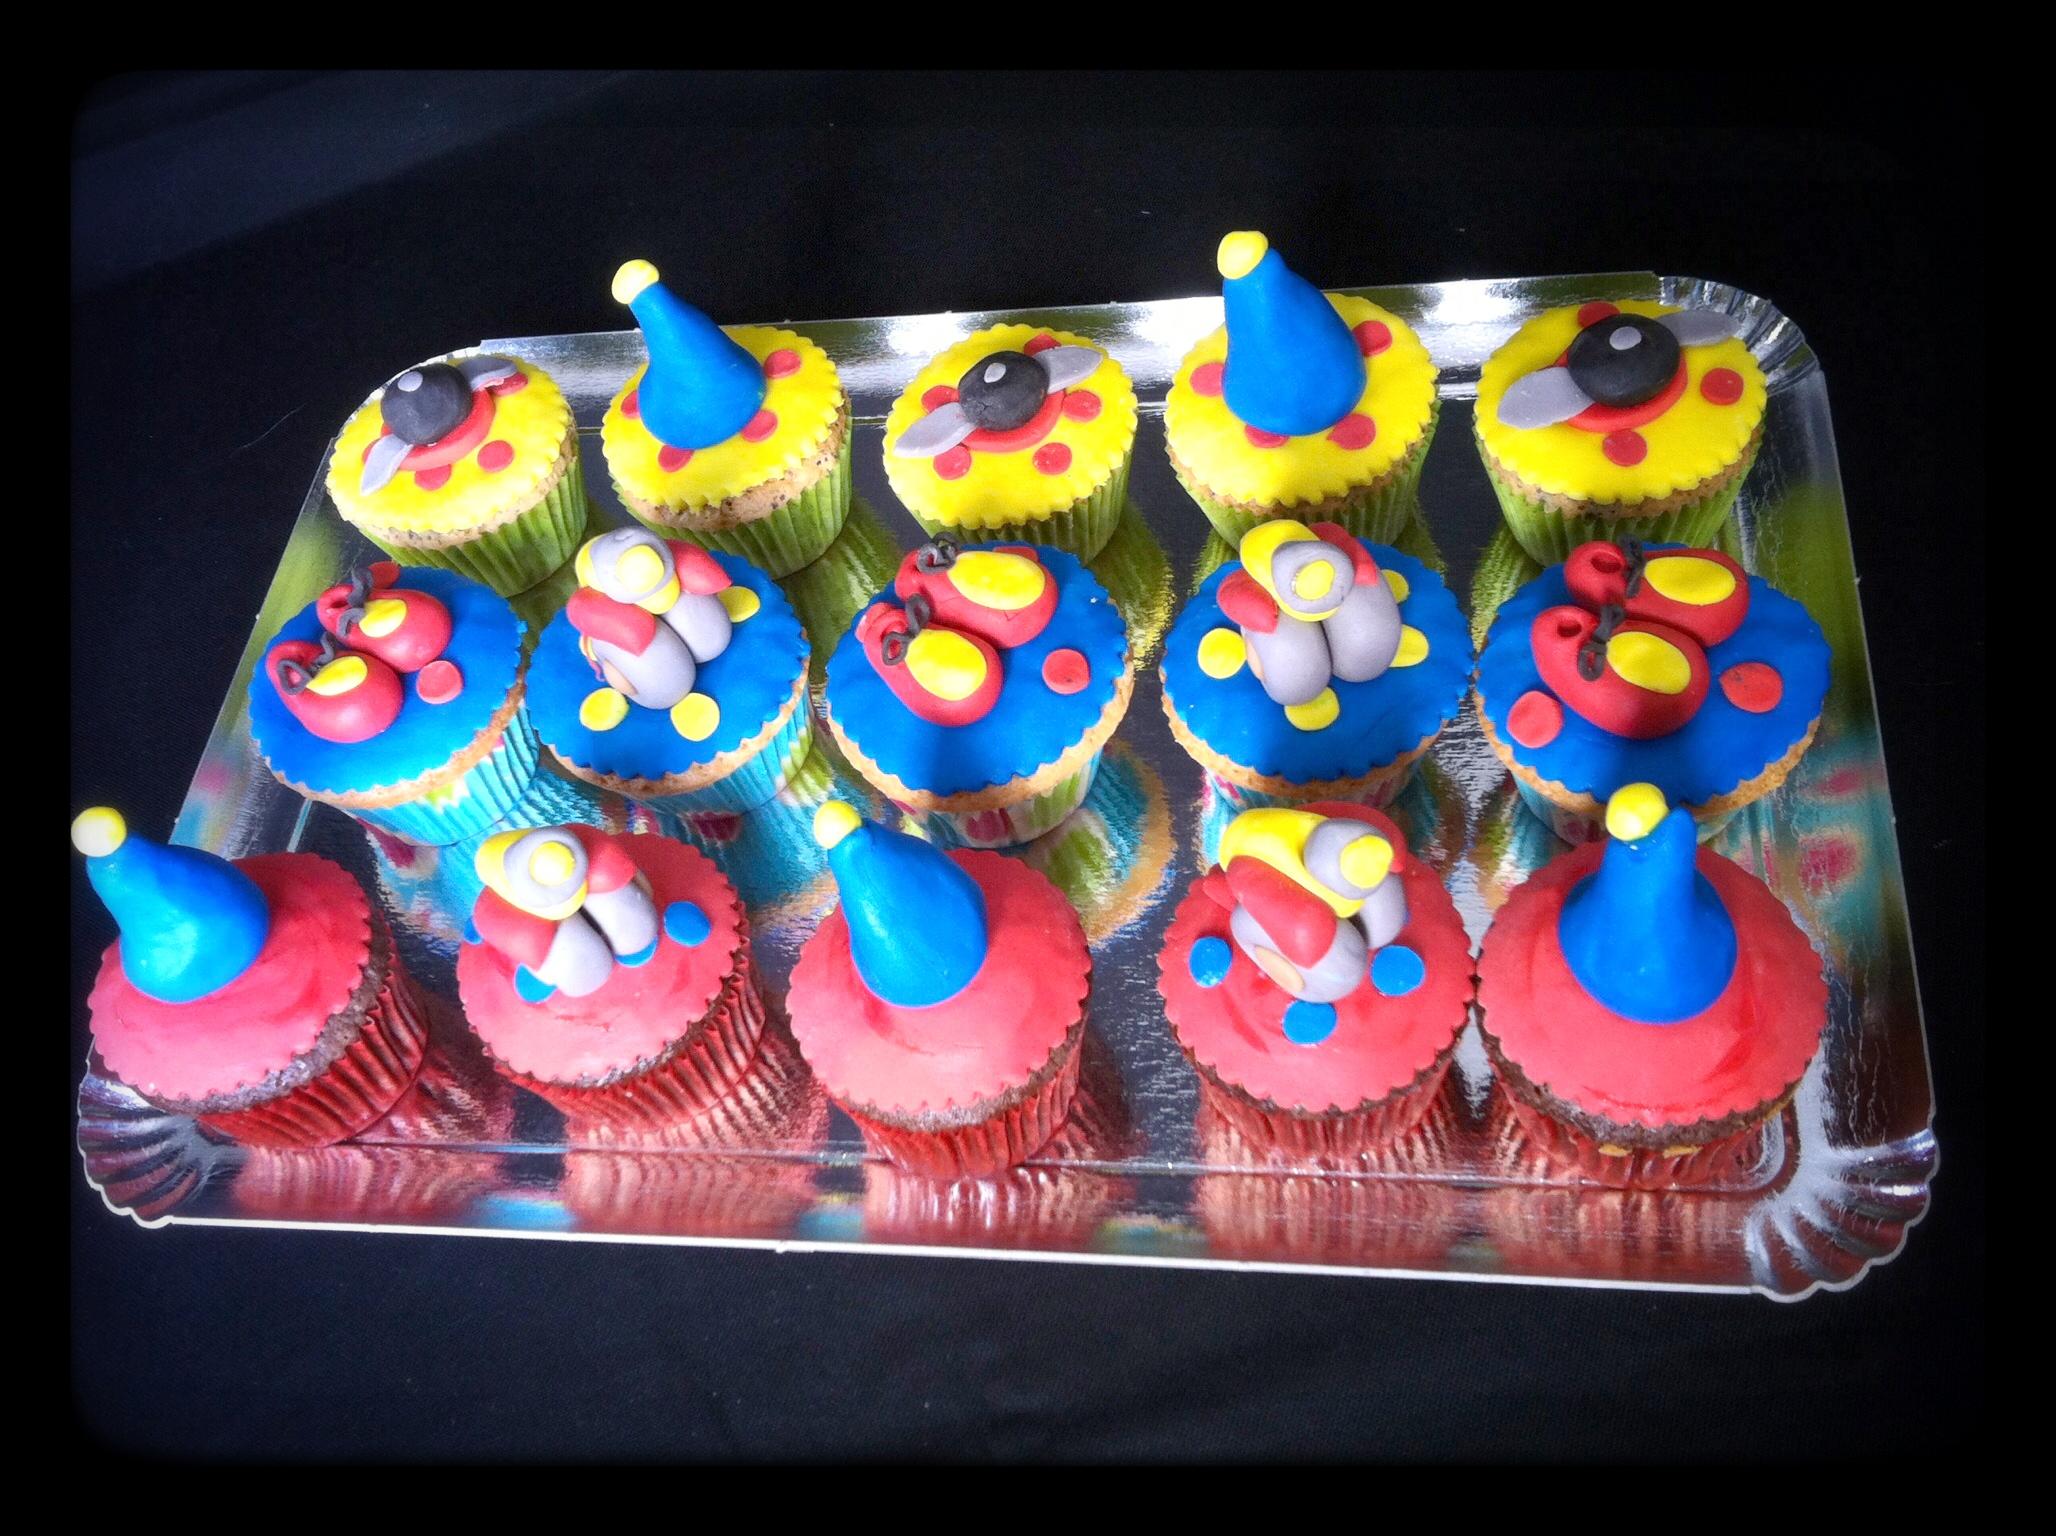 Cupcake décoré Oui-Oui